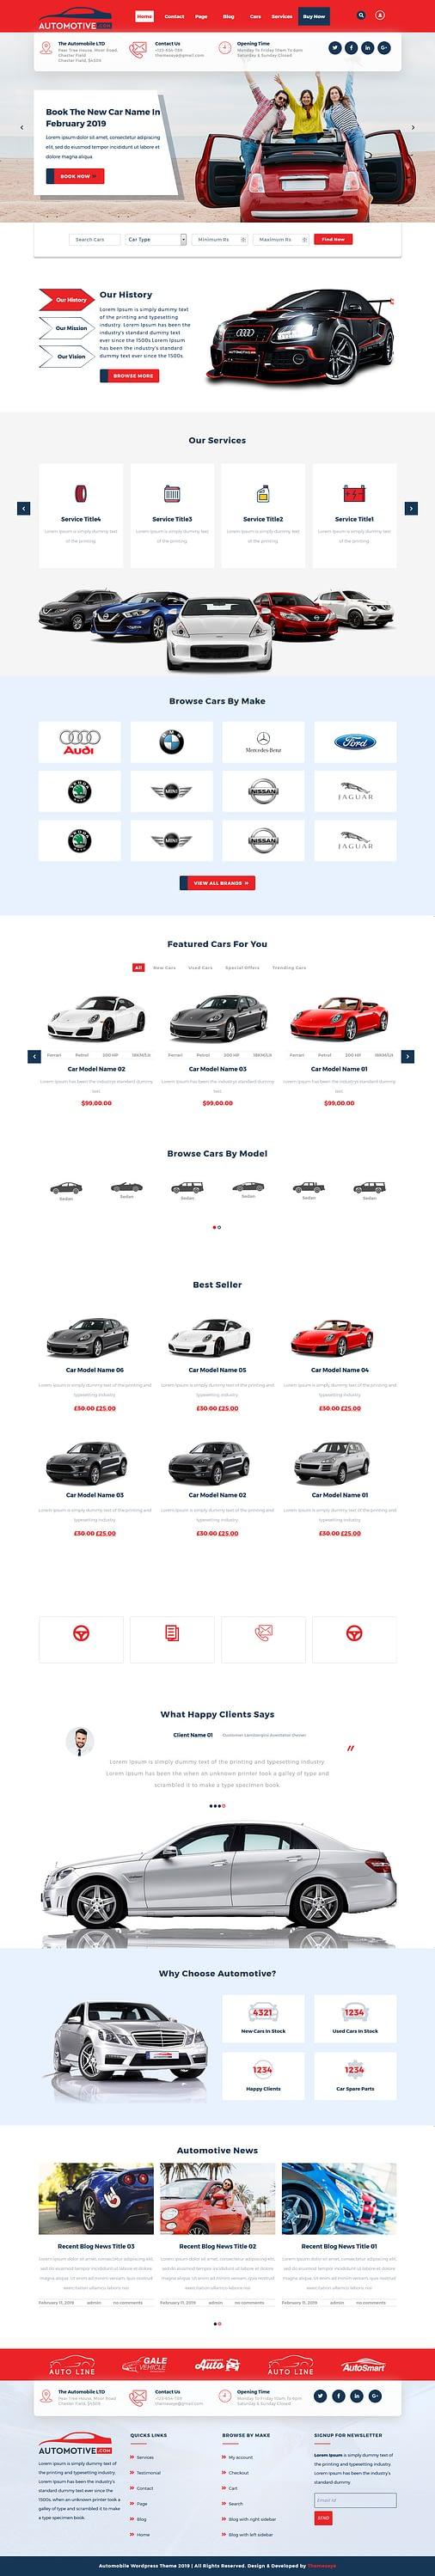 Sayara Automotive - Best Free Automobile WordPress Theme